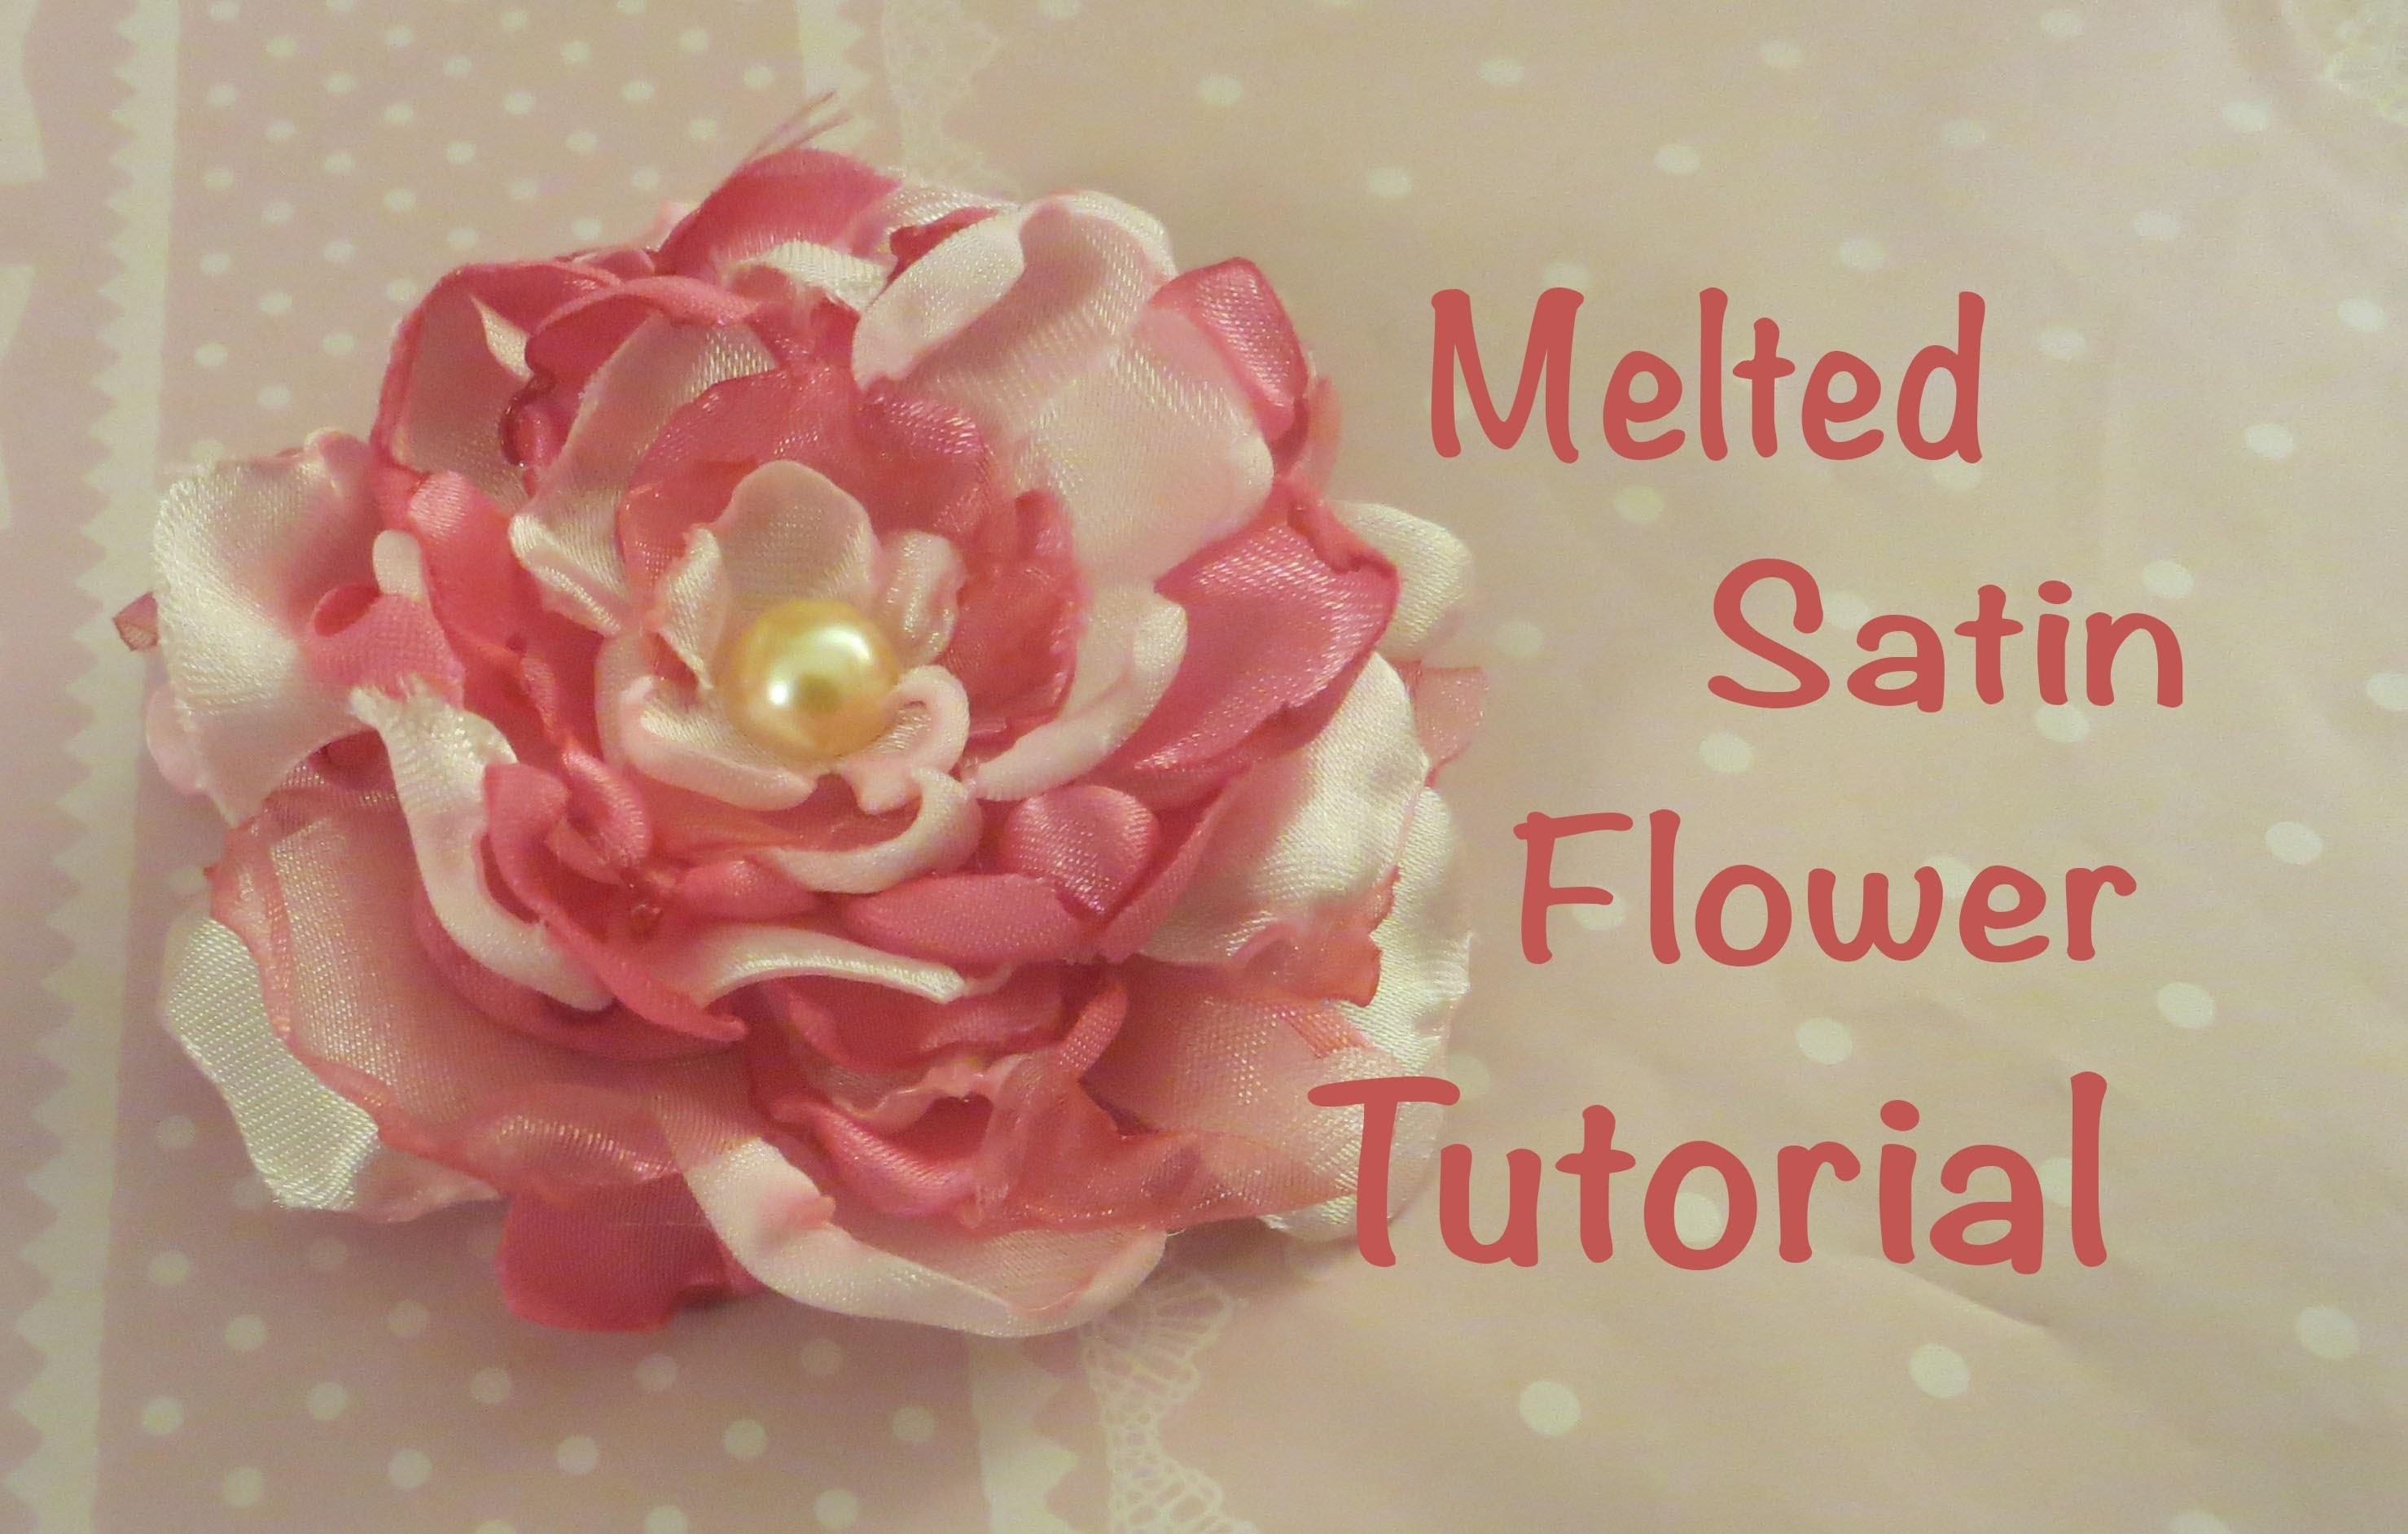 Melted Satin Flower Tutorial